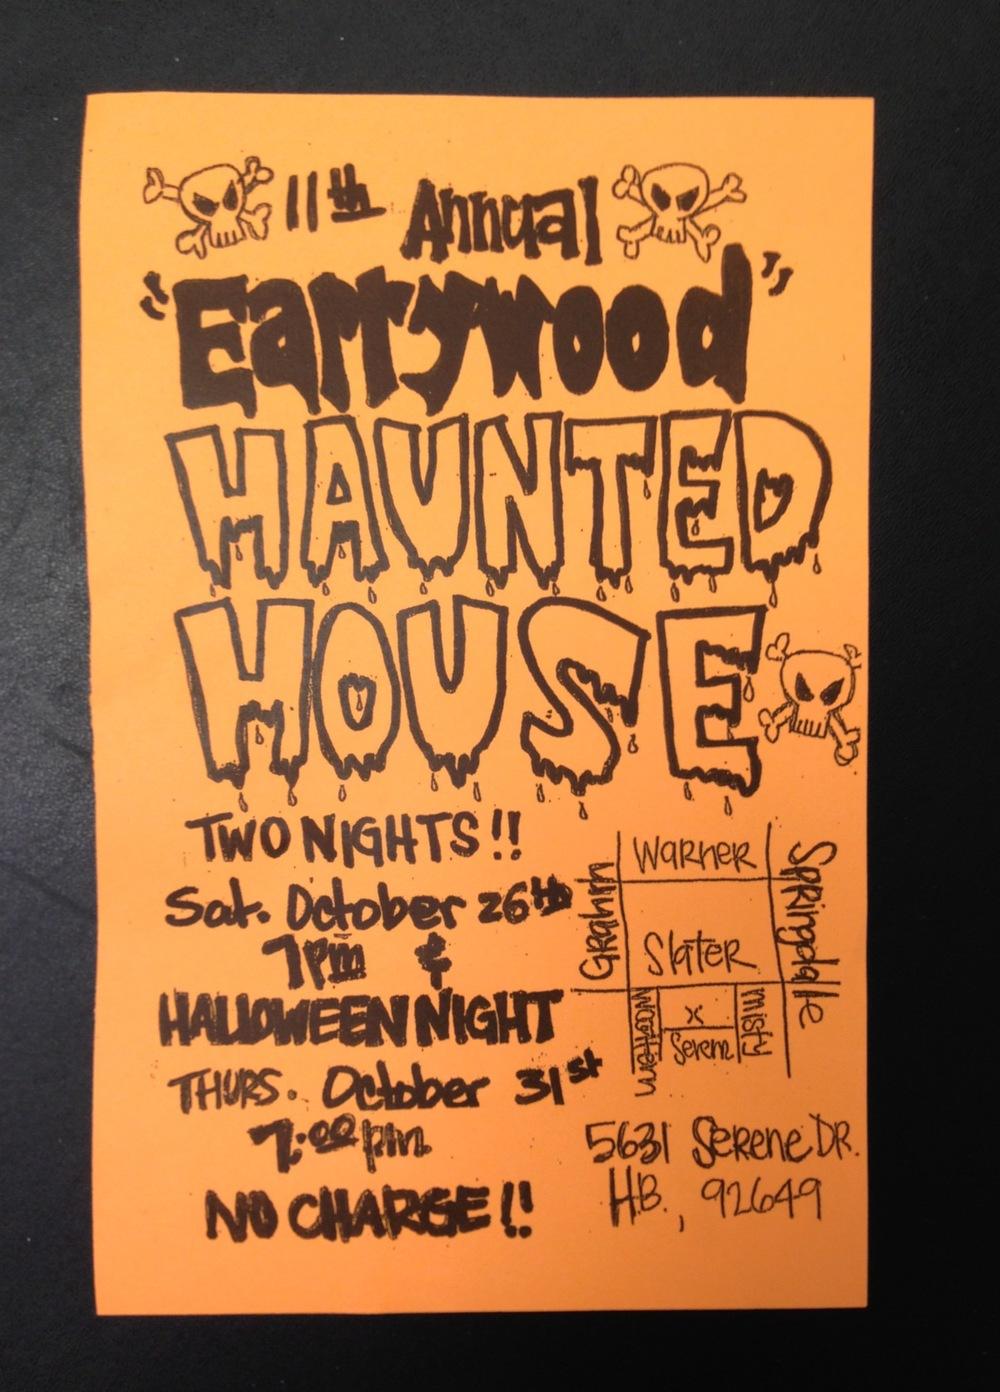 Event flier courtesy of Ken Earwood